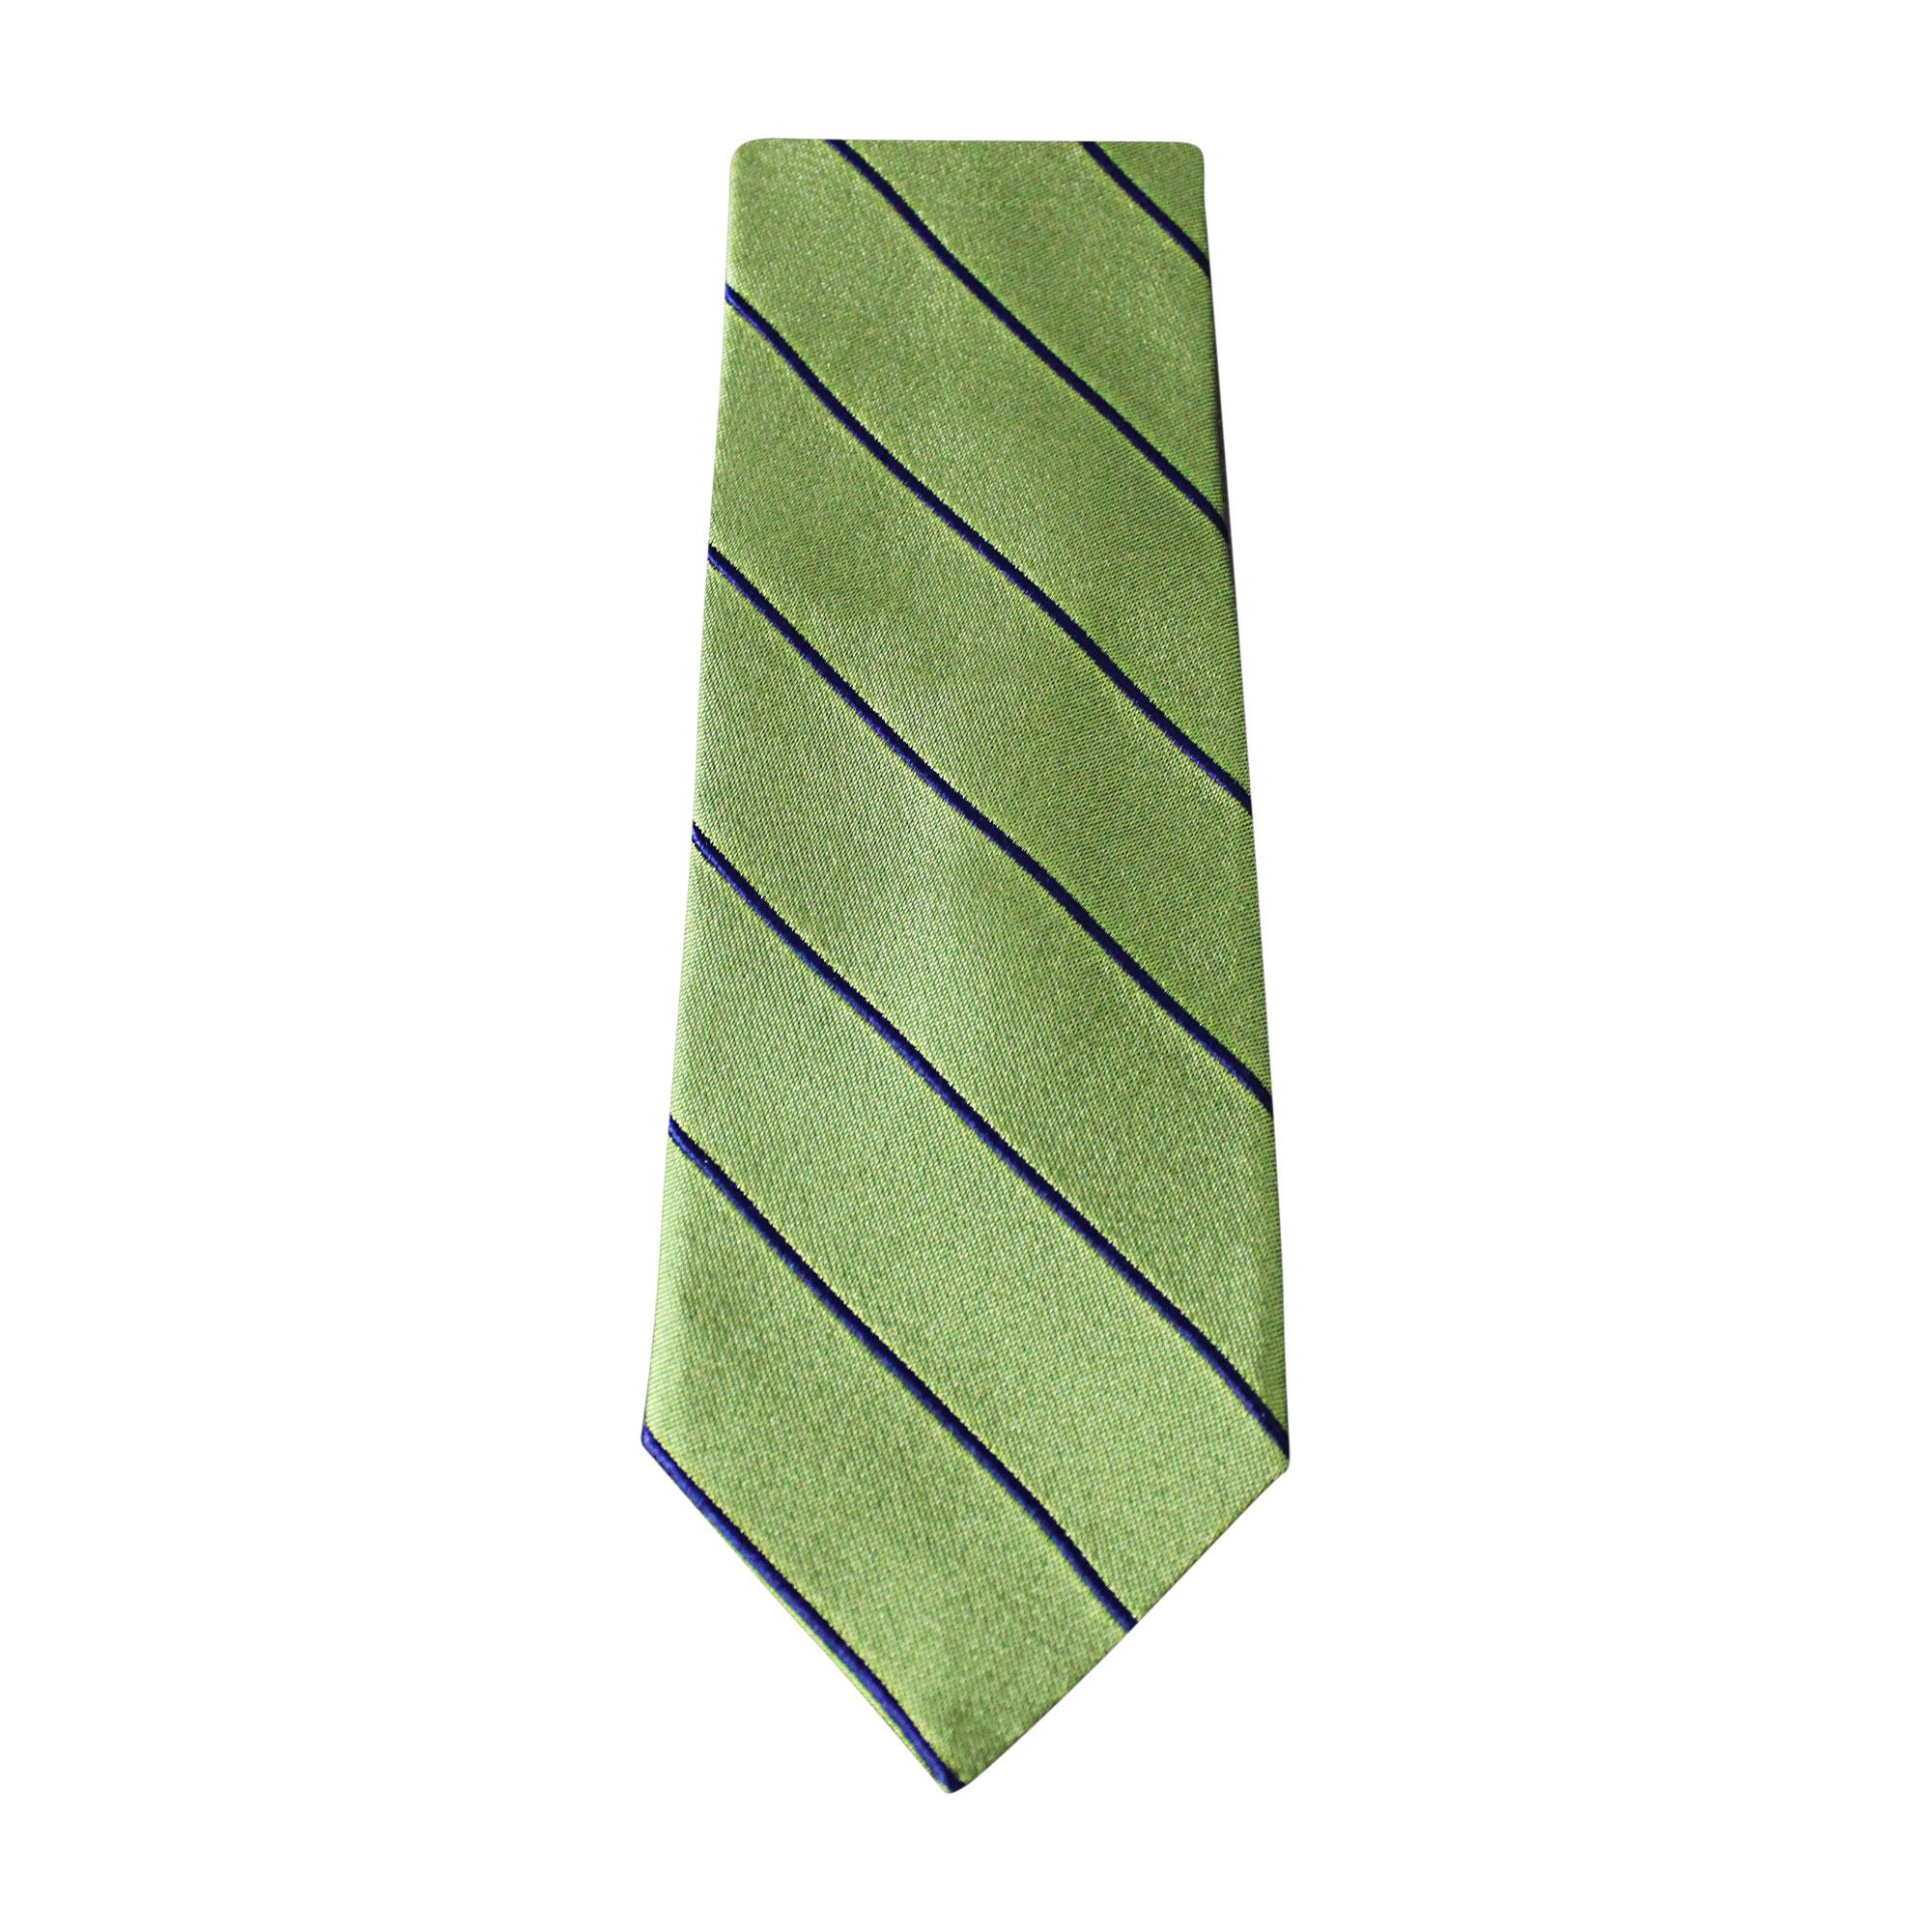 Cravate OLD ENGLAND Vert